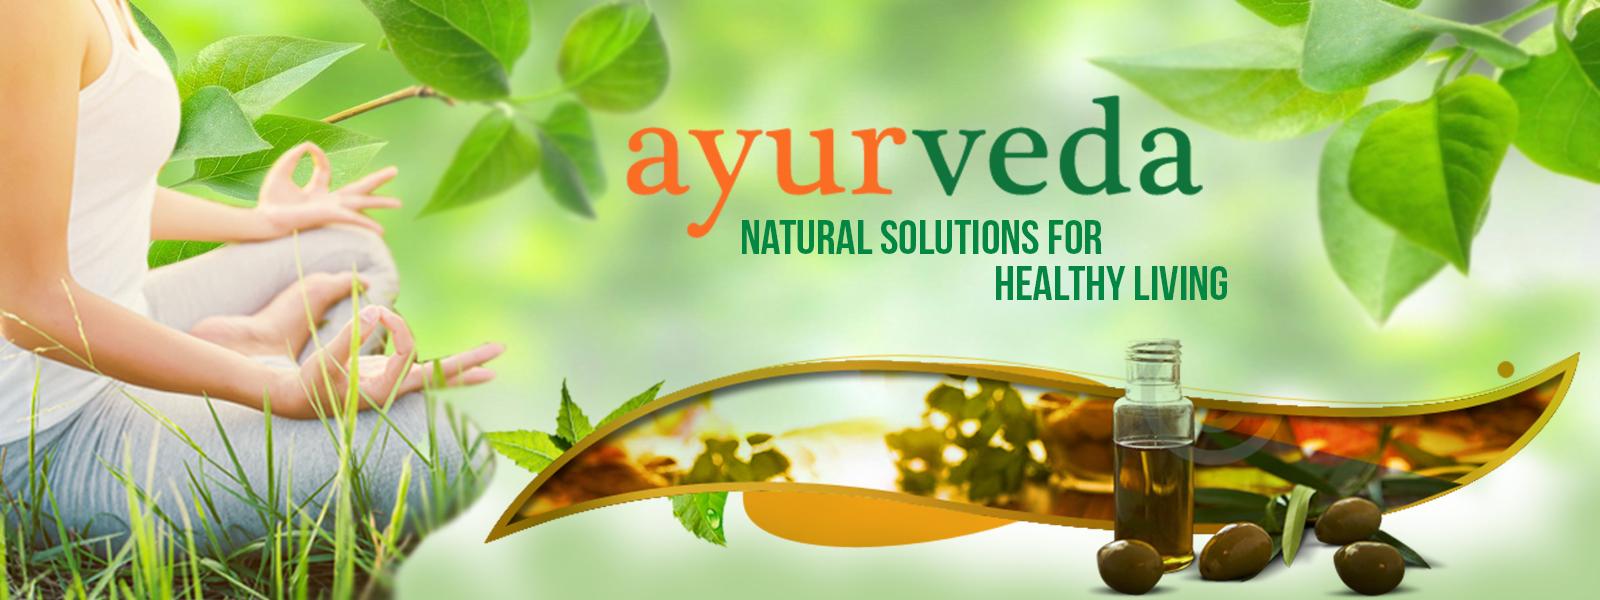 banner-ayurveda-copy